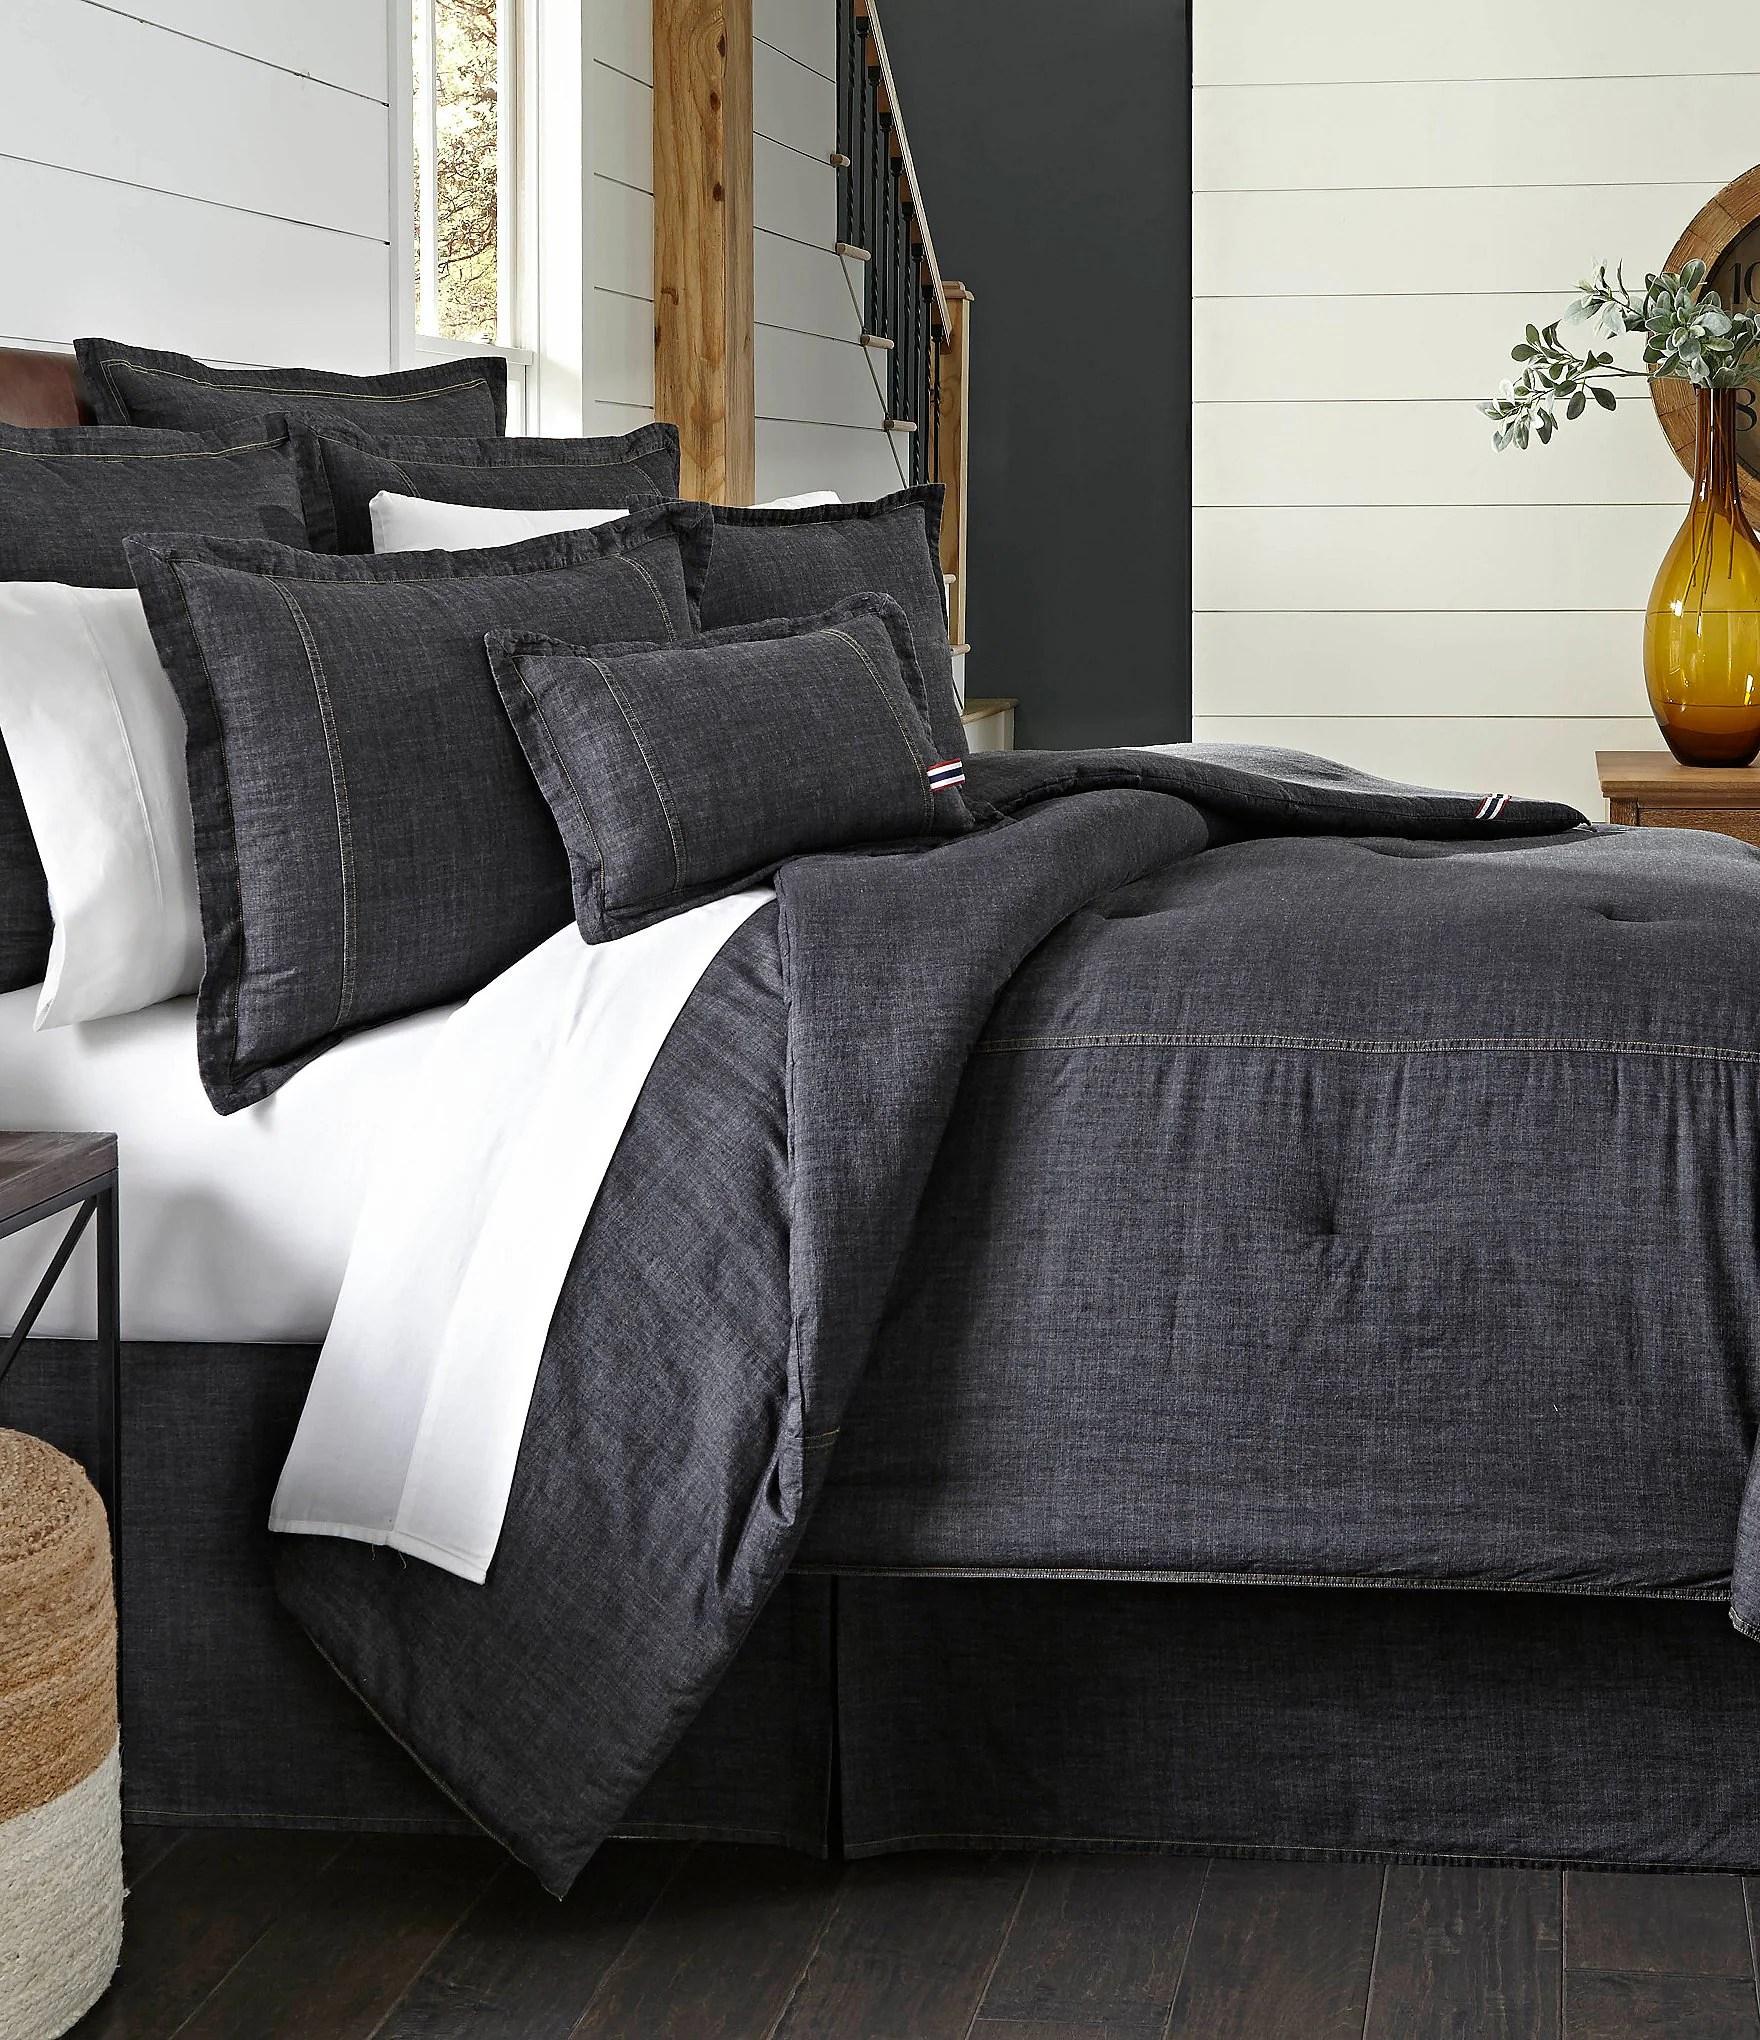 Cremieux Vintage Washed Denim Comforter  Dillards